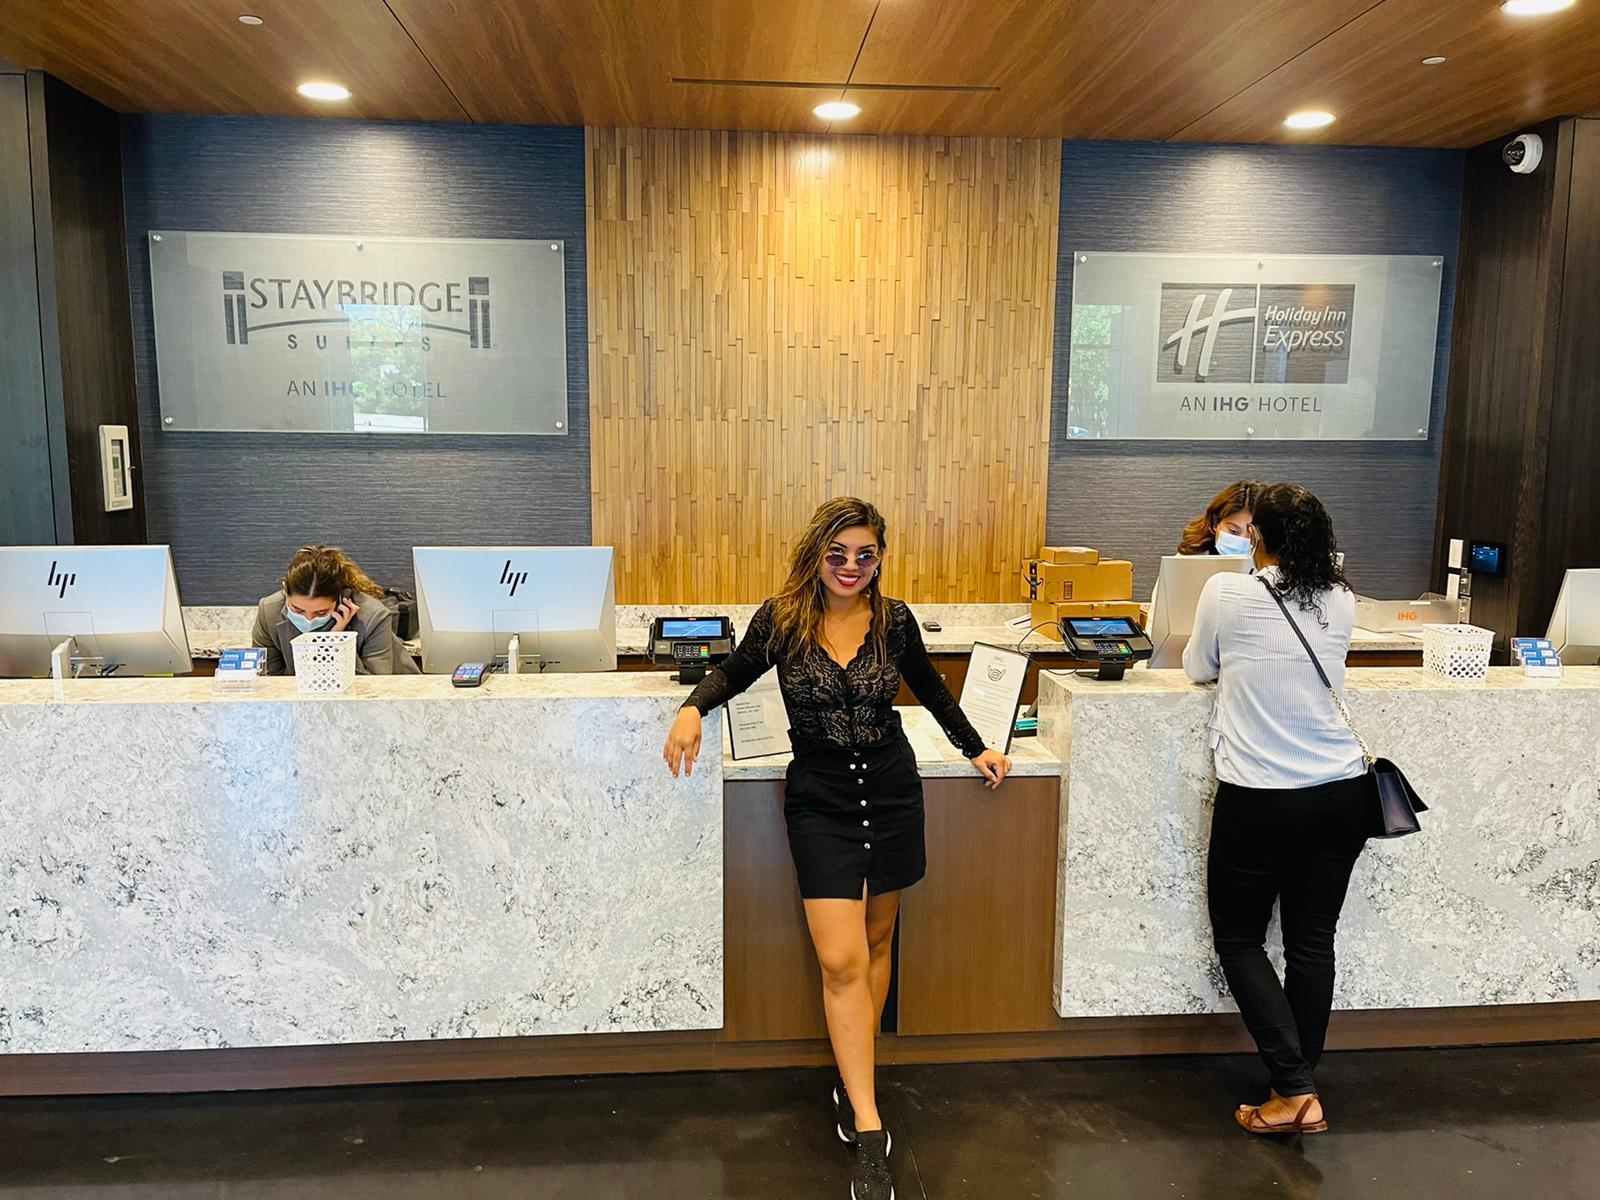 Holiday Inn ExprHoliday Inn Express Houston New hotel in Galleriaess New hotel in Galleriaess 28